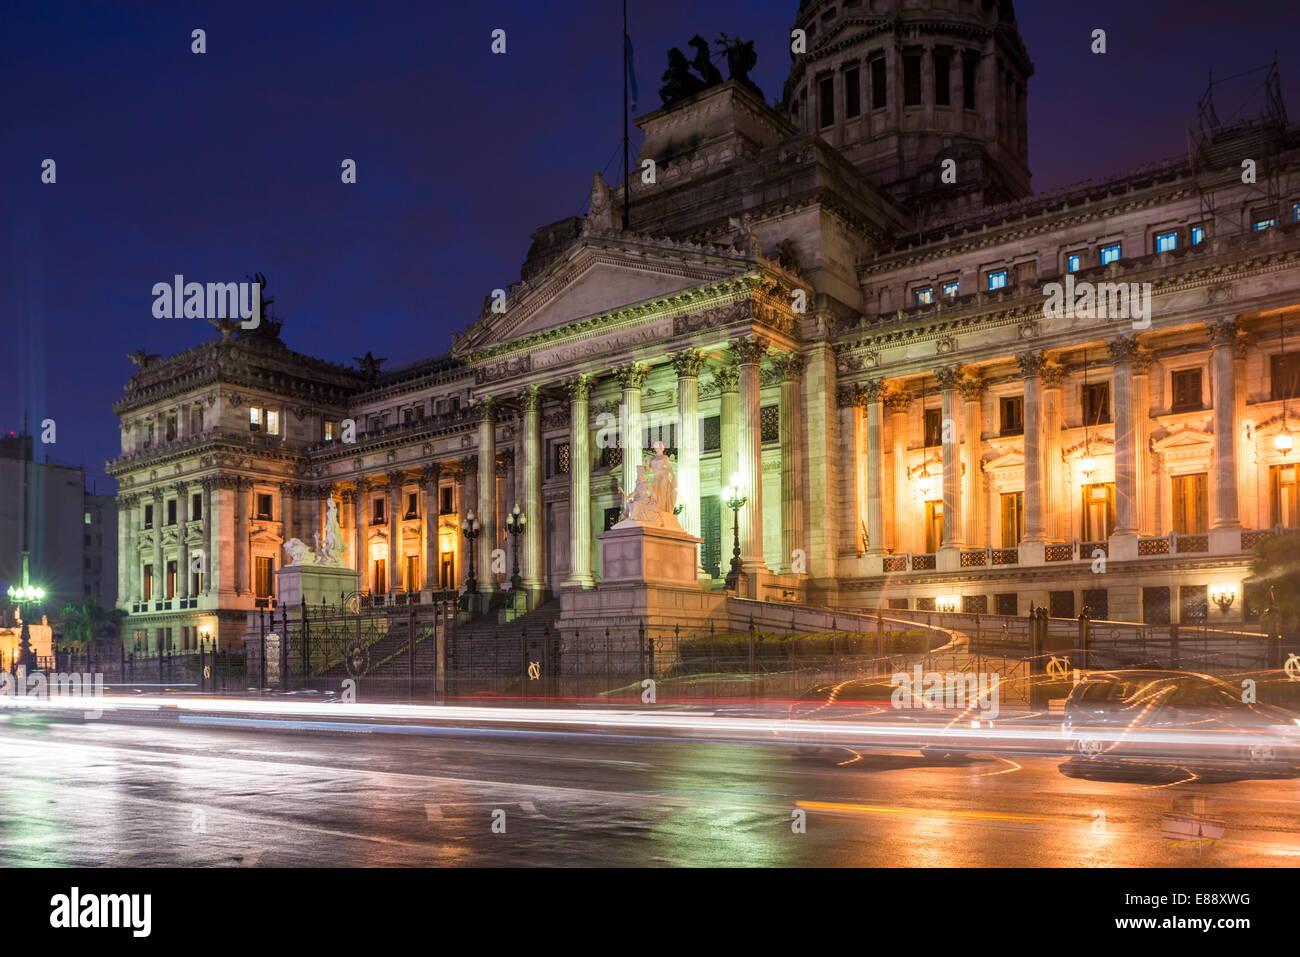 Palacio del Congreso de nuit, Buenos Aires, Argentine, Amérique du Sud Photo Stock